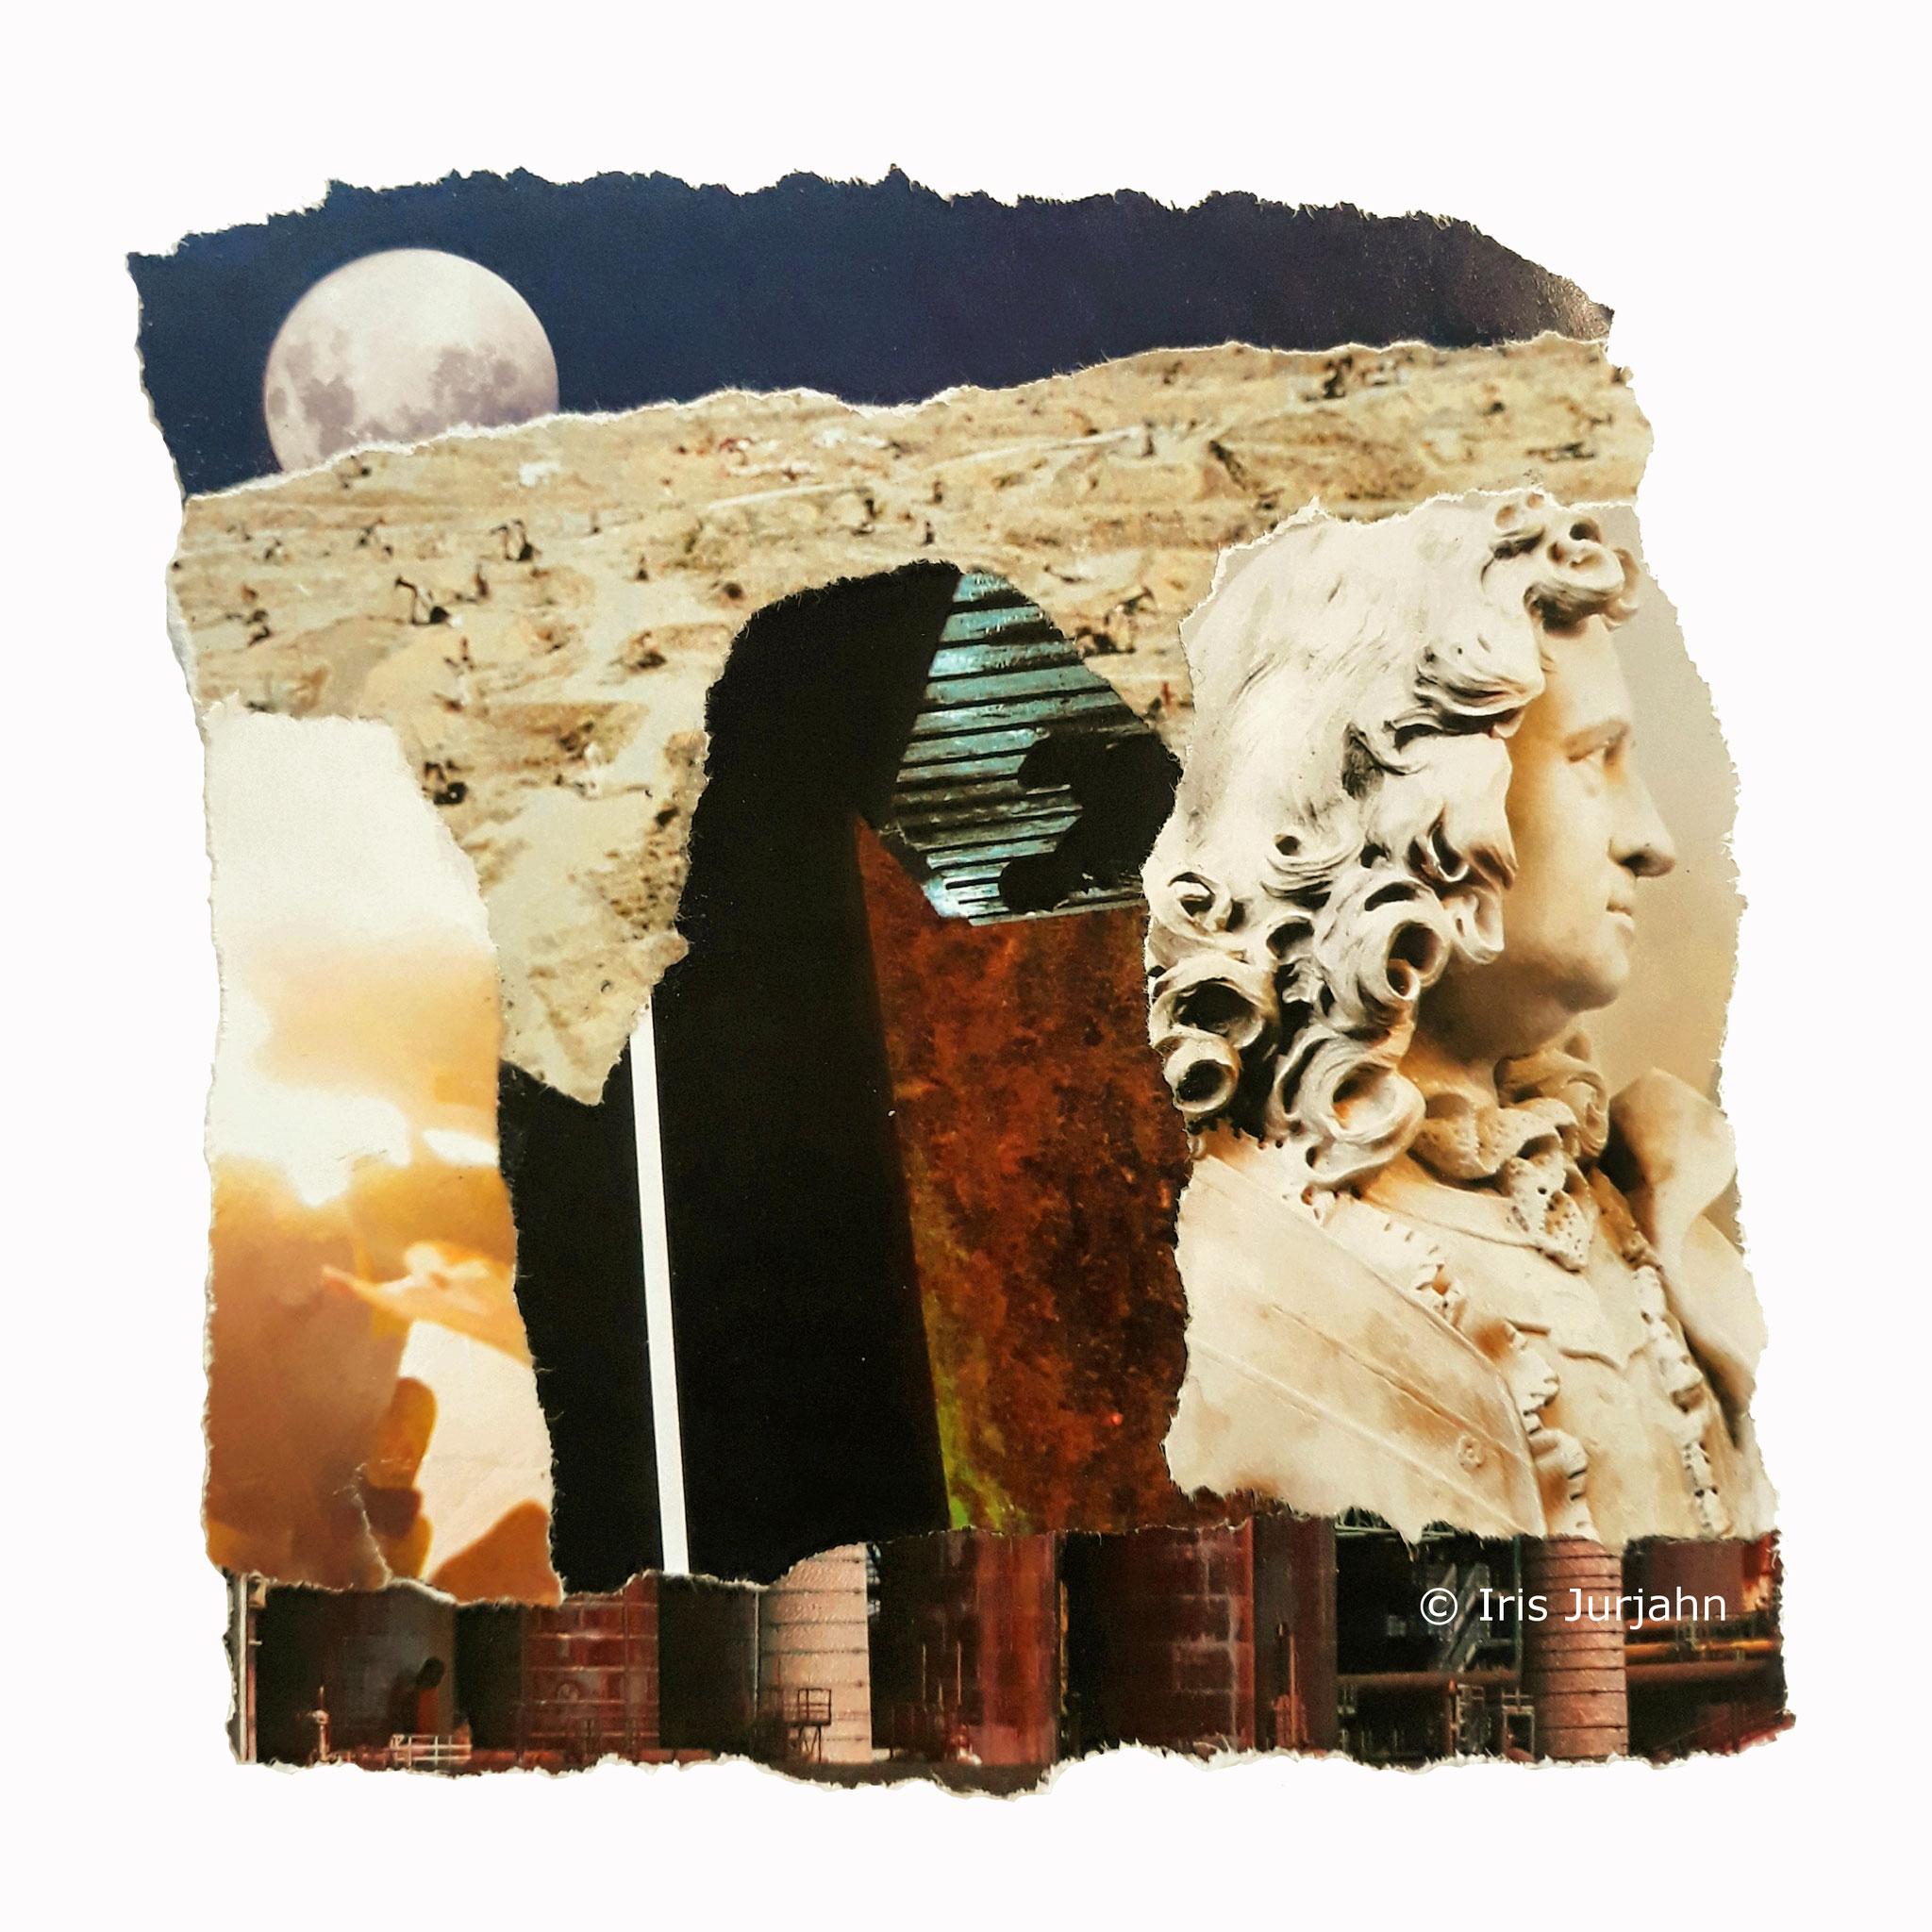 Lunlumo, Papiercollage, 22 x 22 cm  (inkl. Objektrahmen), 2019